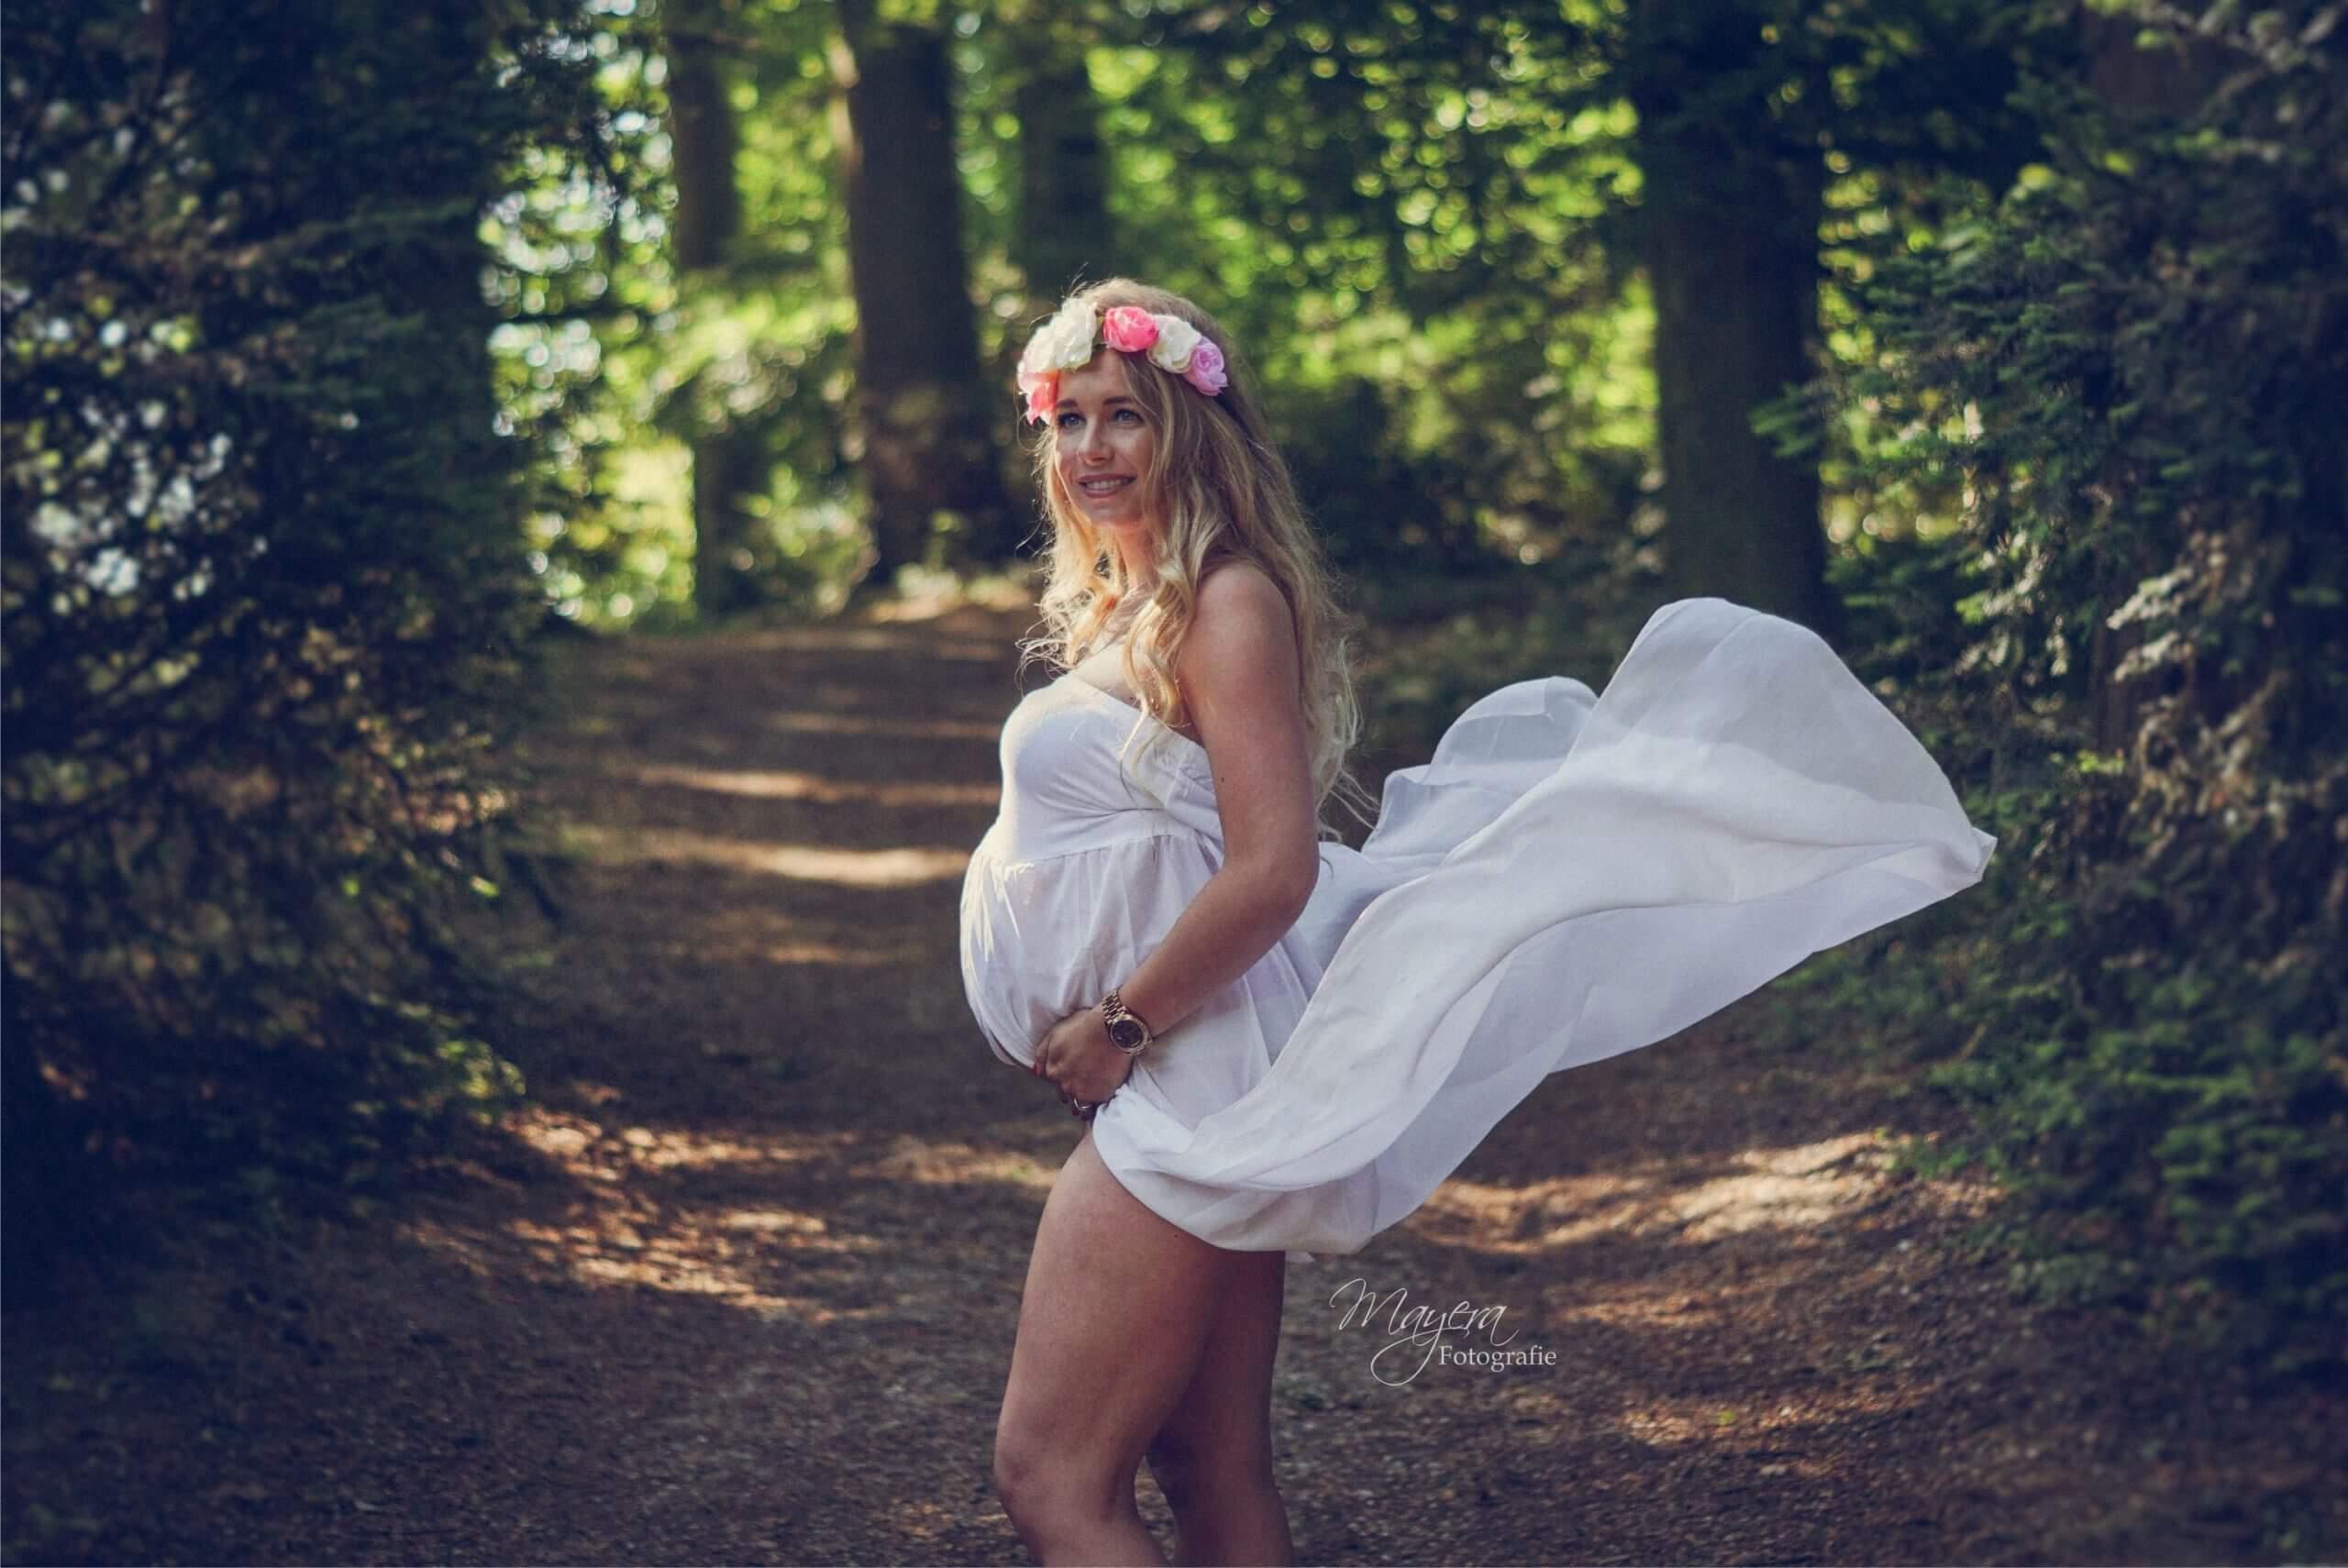 jurk mama to be het bos